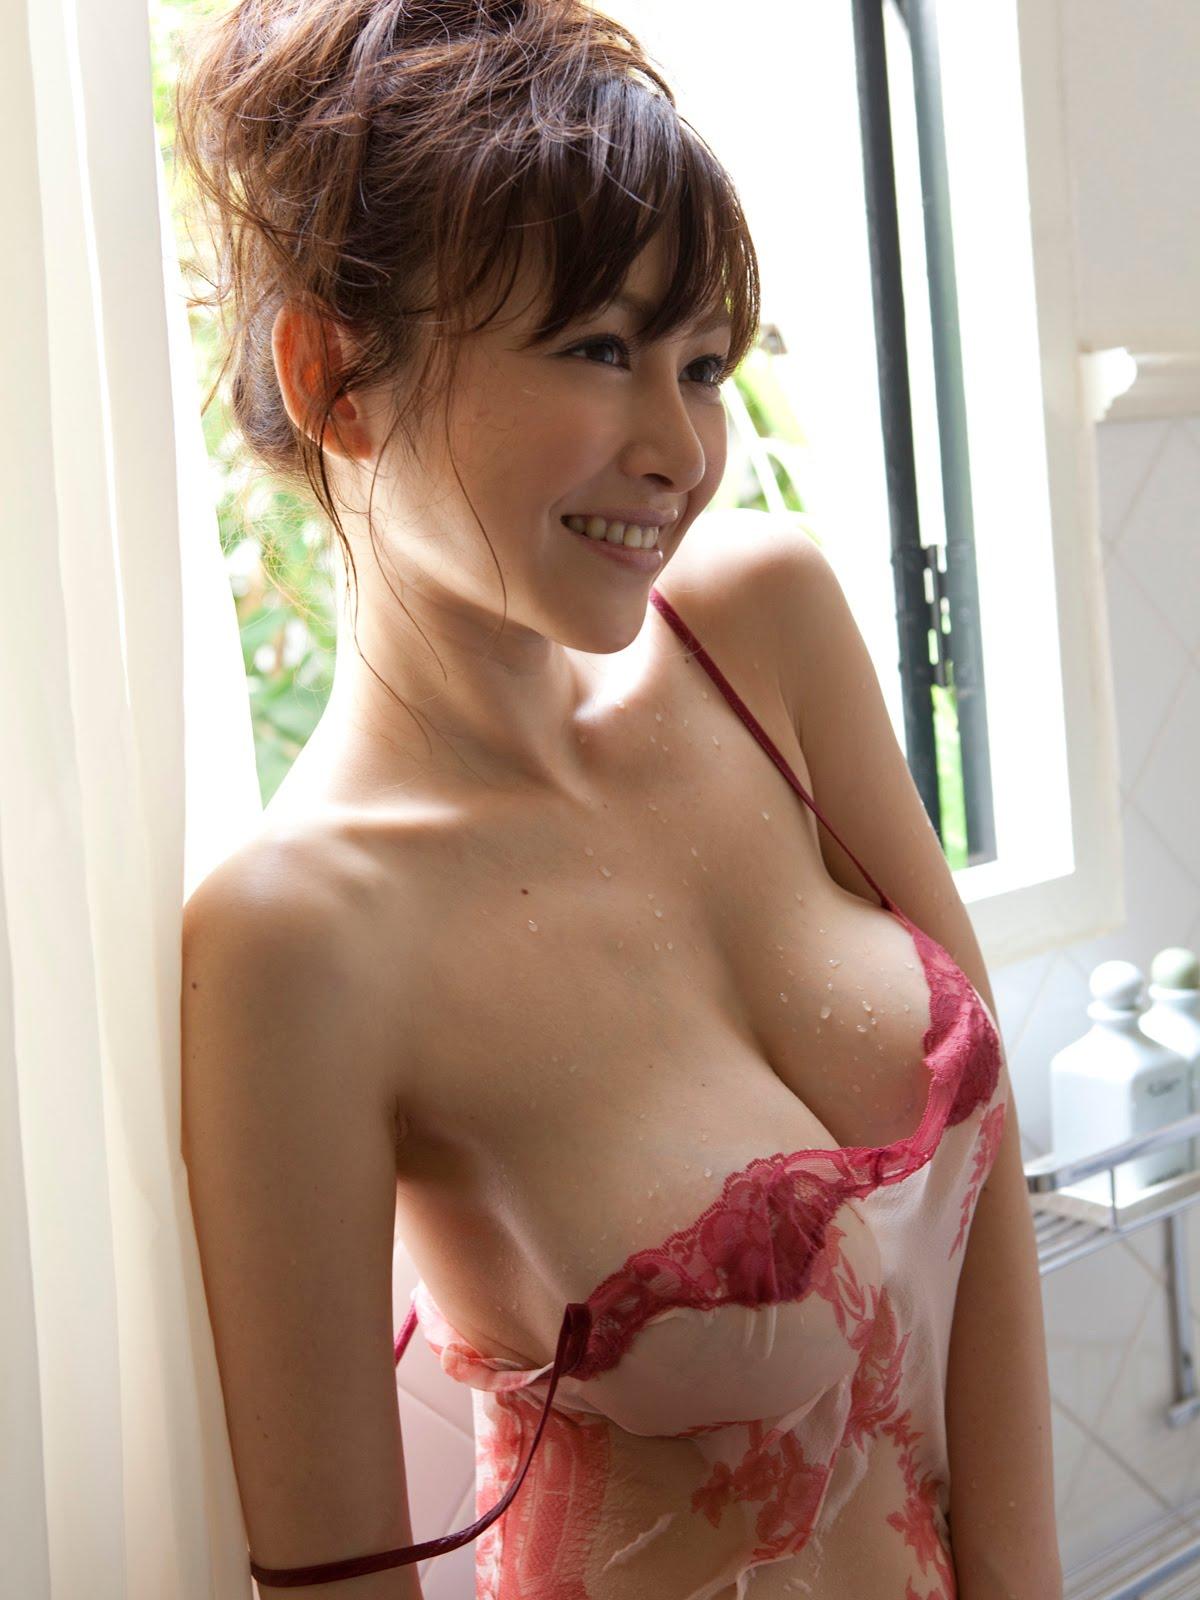 Naked anri sugihara Uncensored anri